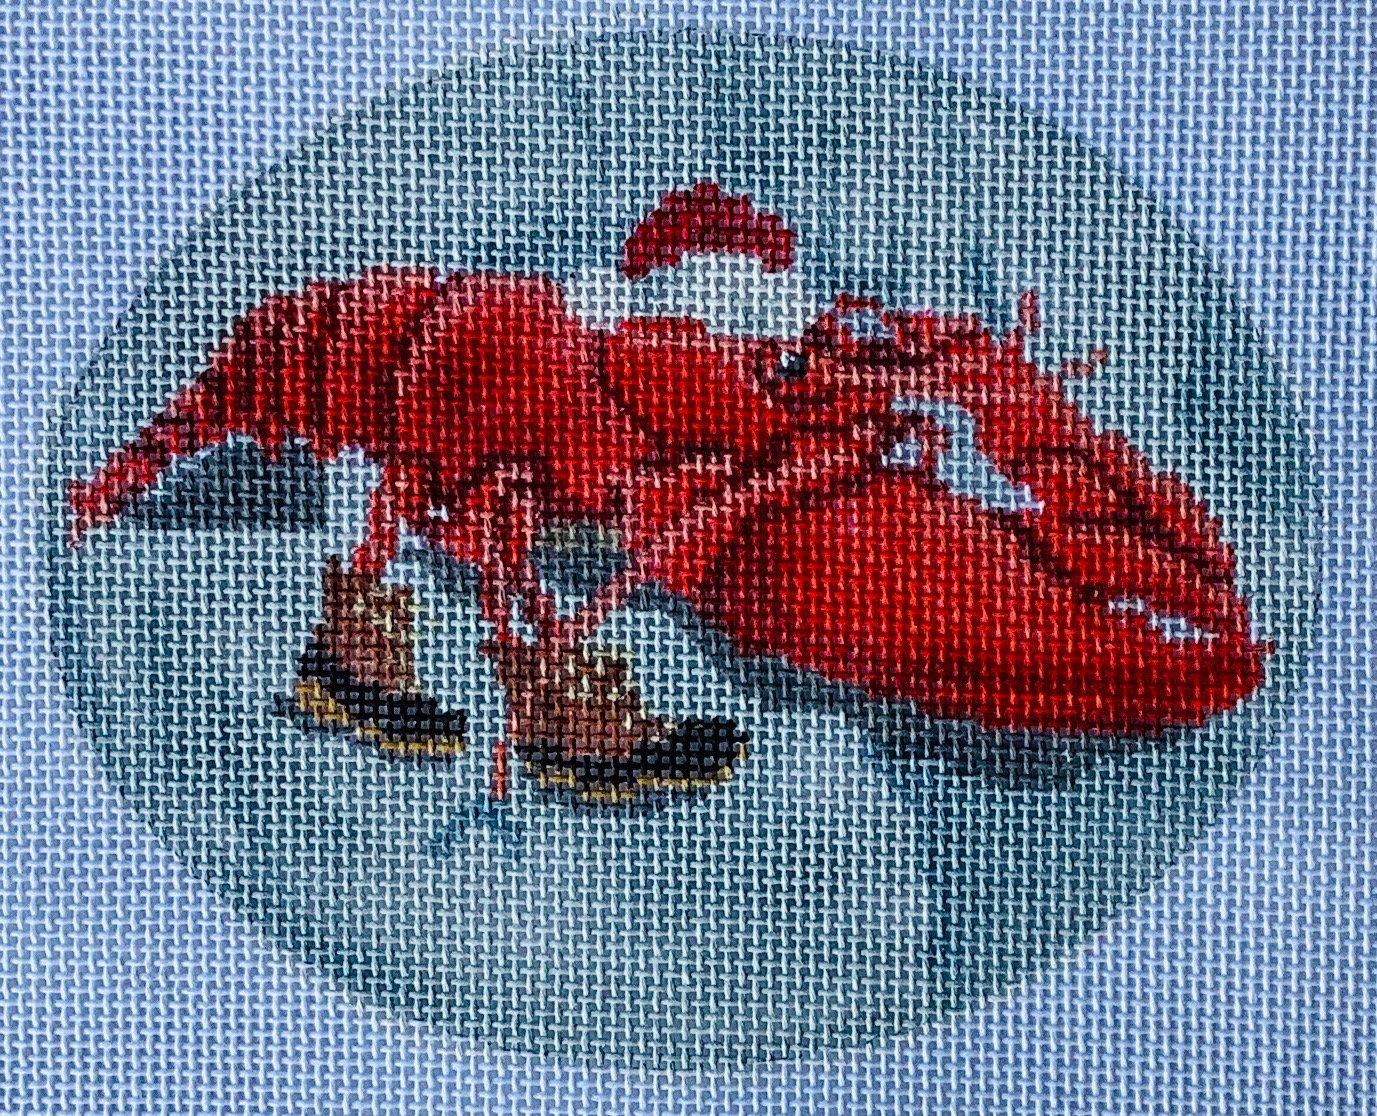 SCXO48 Lobstah Ornament CBK Needlepoint Collections